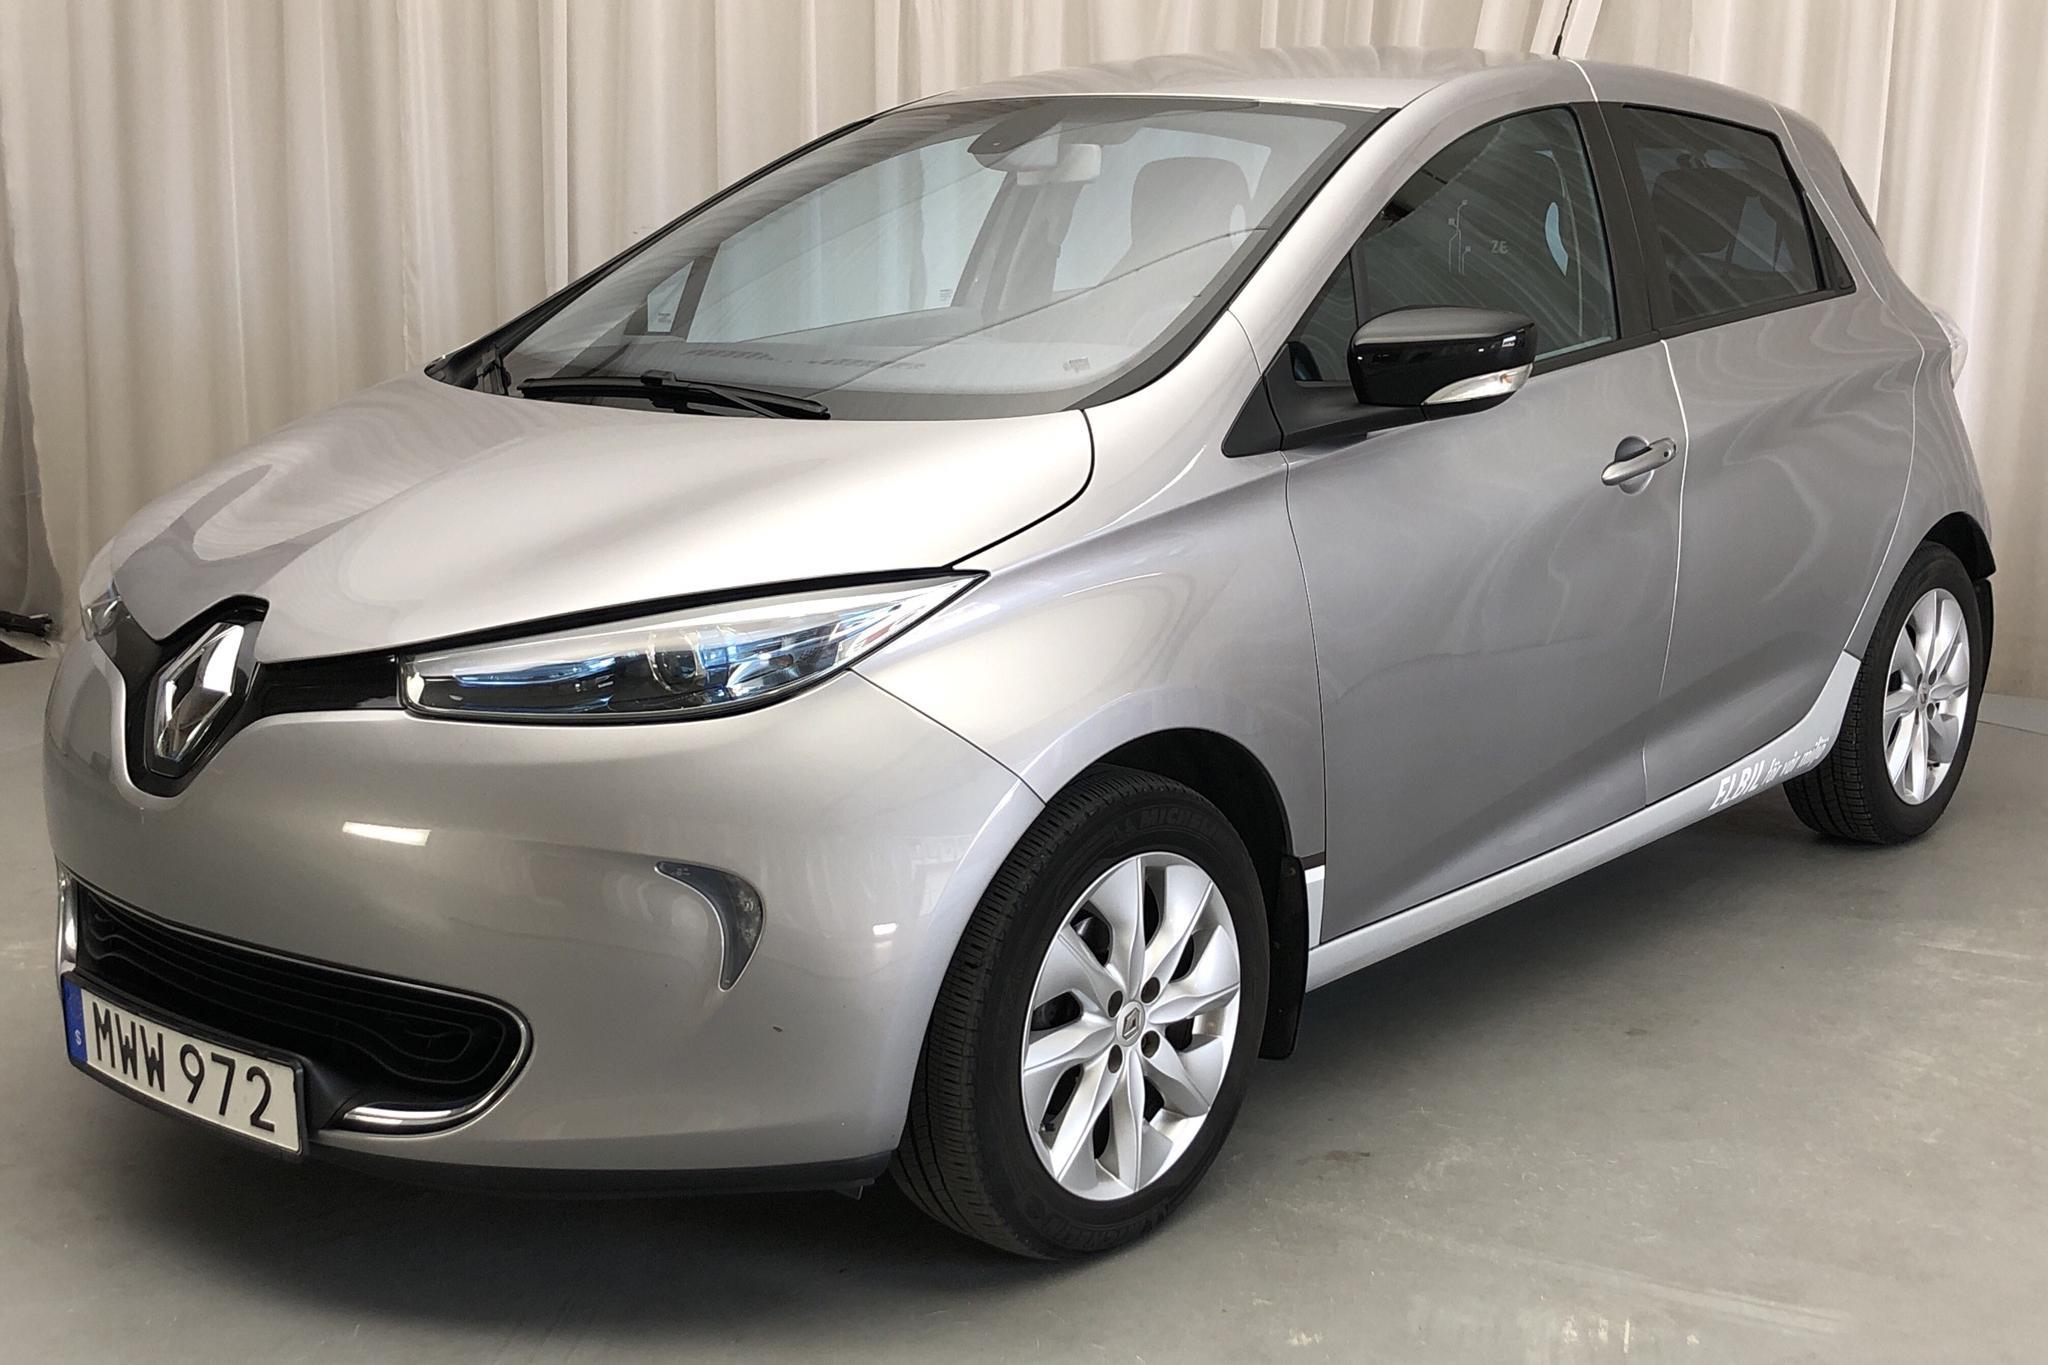 Renault Zoe 22 kWh R88 (88hk) - 85 930 km - Automatic - gray - 2016